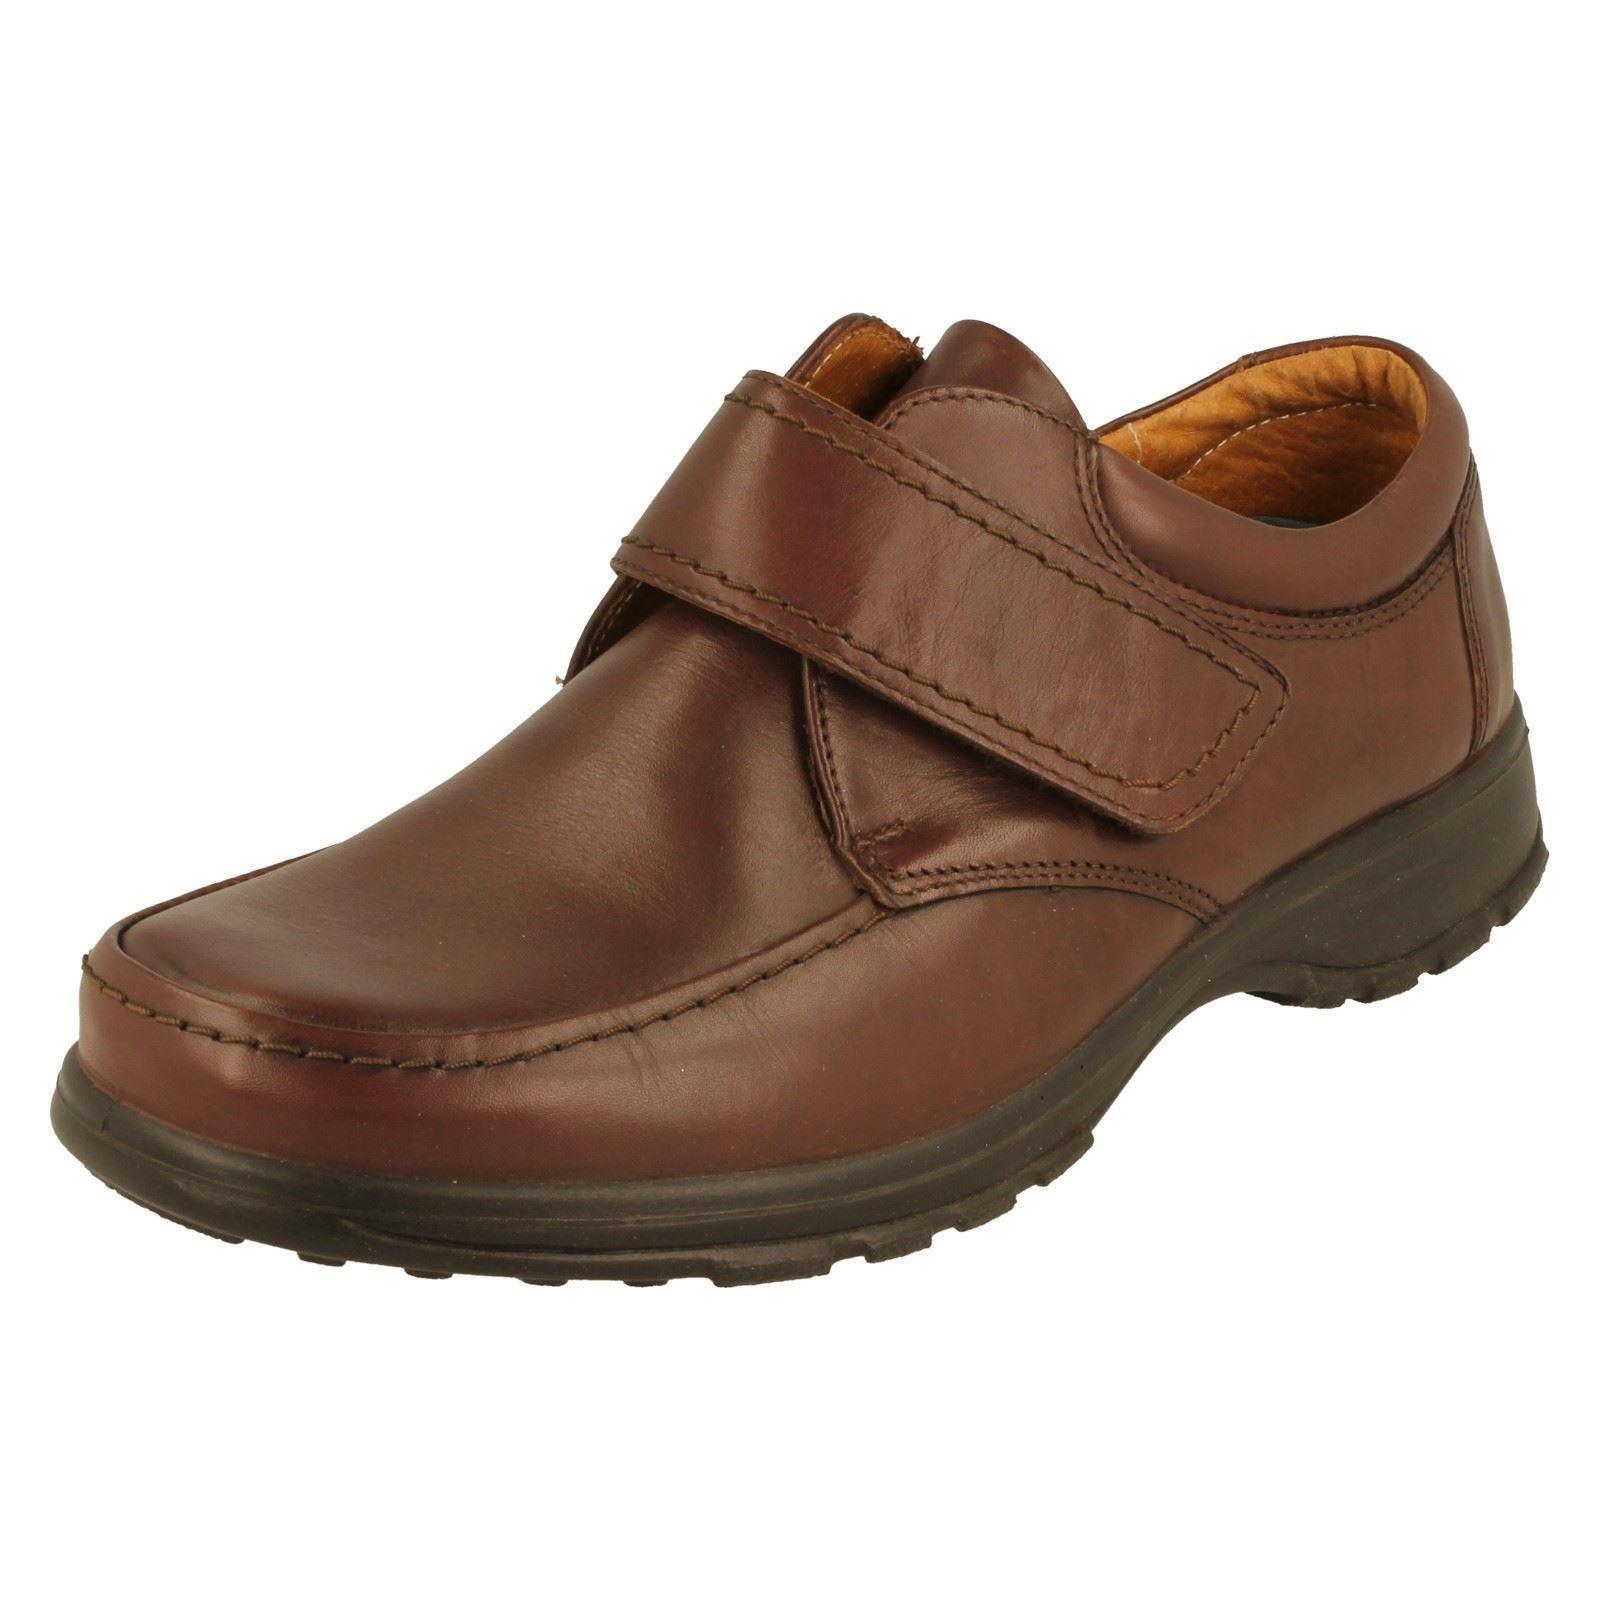 Billig hohe Qualität Shoes Mens DB Shoes Qualität Style Norman-W 608f12